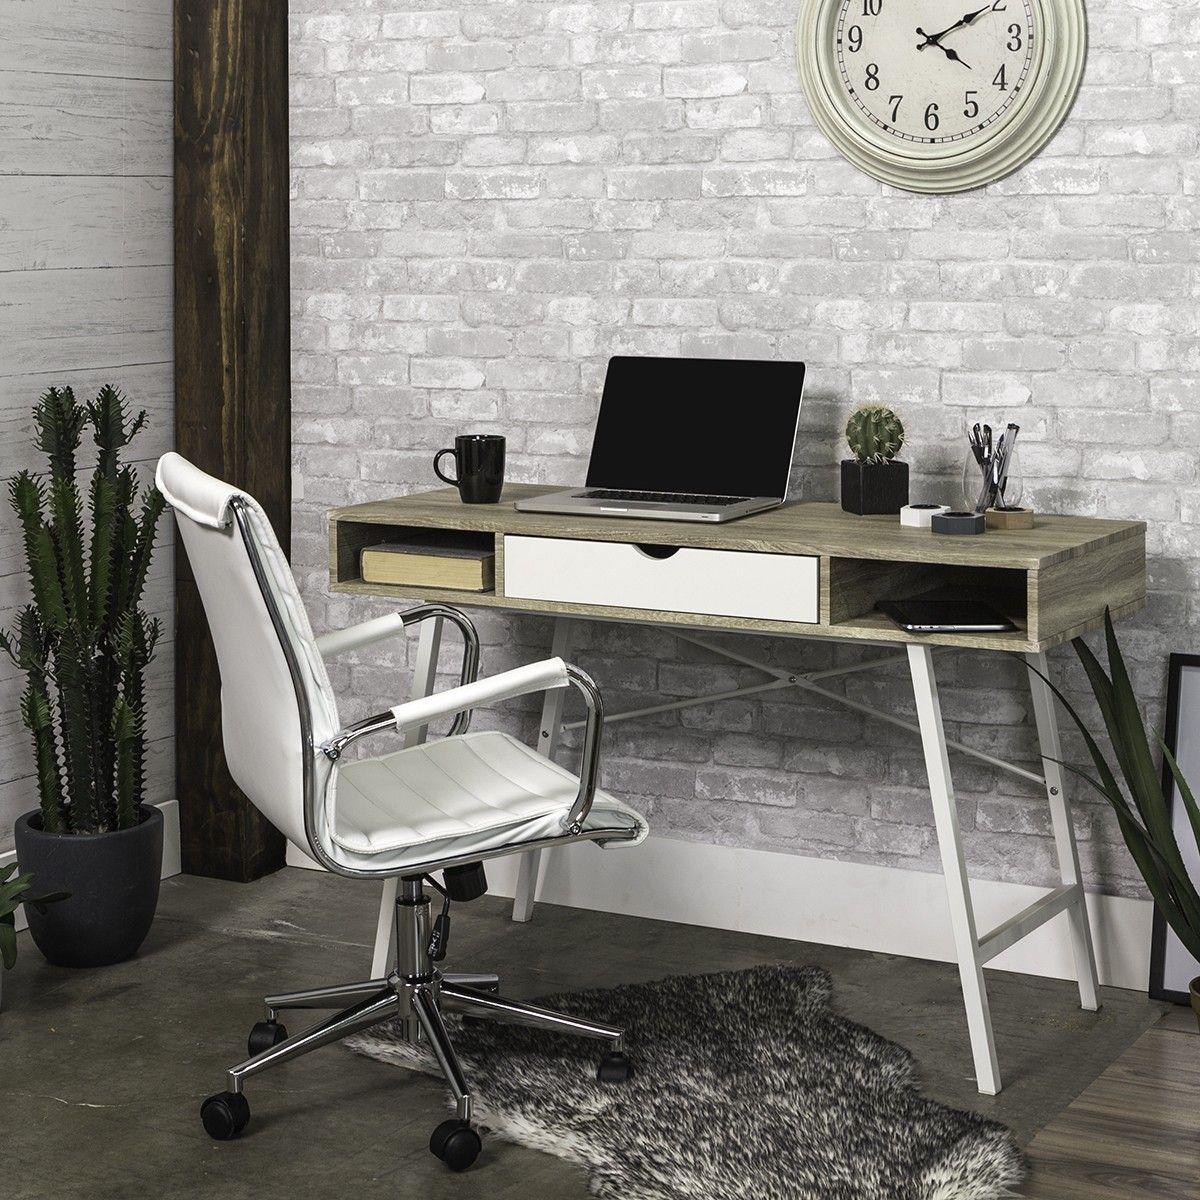 Desk Chair Jysk Wedding Ceremony Decorations Diy Abbetved White Deco Home Office Ja